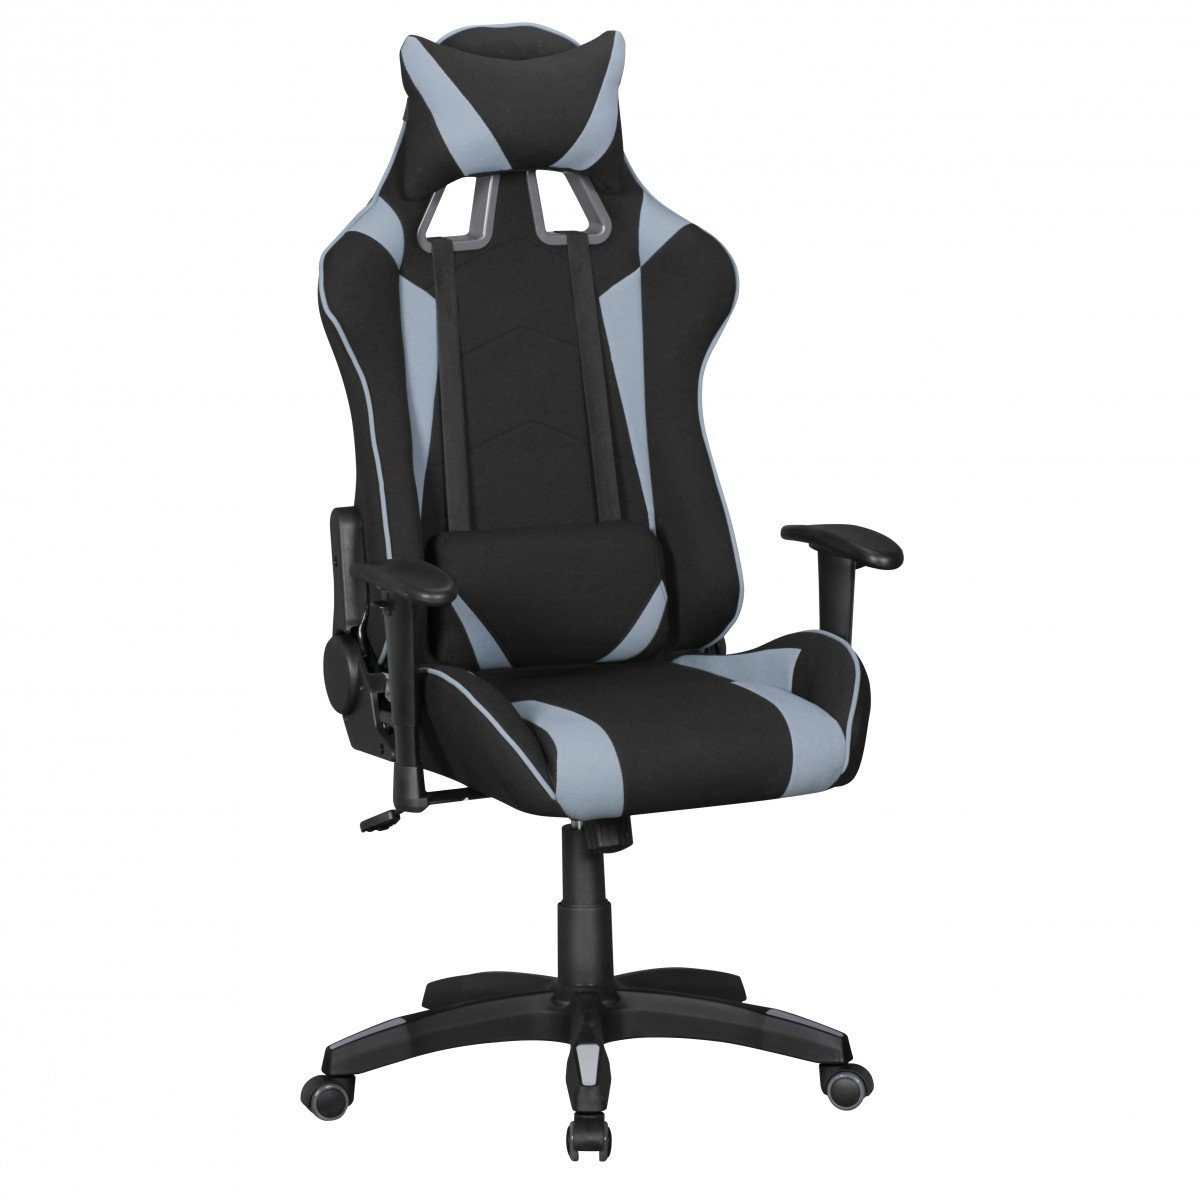 Amstyle Score Gaming Chair mit Stoff-Bezug   Drehstuhl in Race-Optik) Schwarz Grau